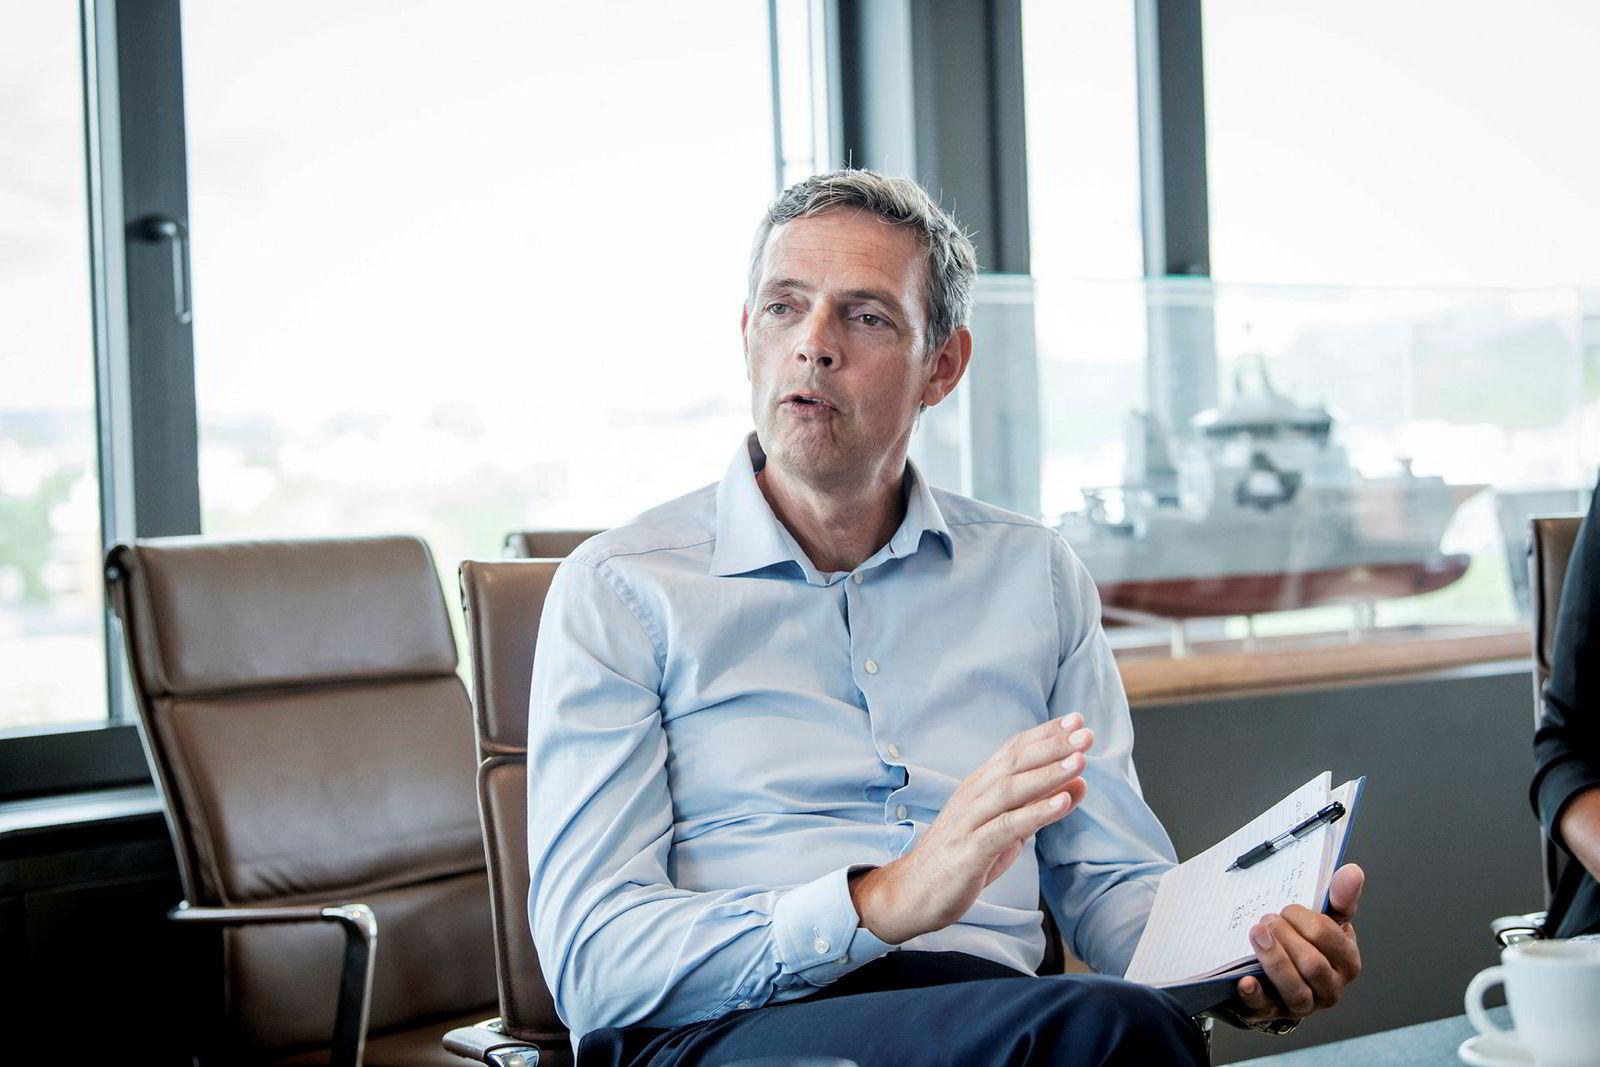 Råvareanalysesjef Bjarne Schieldrop i SEB